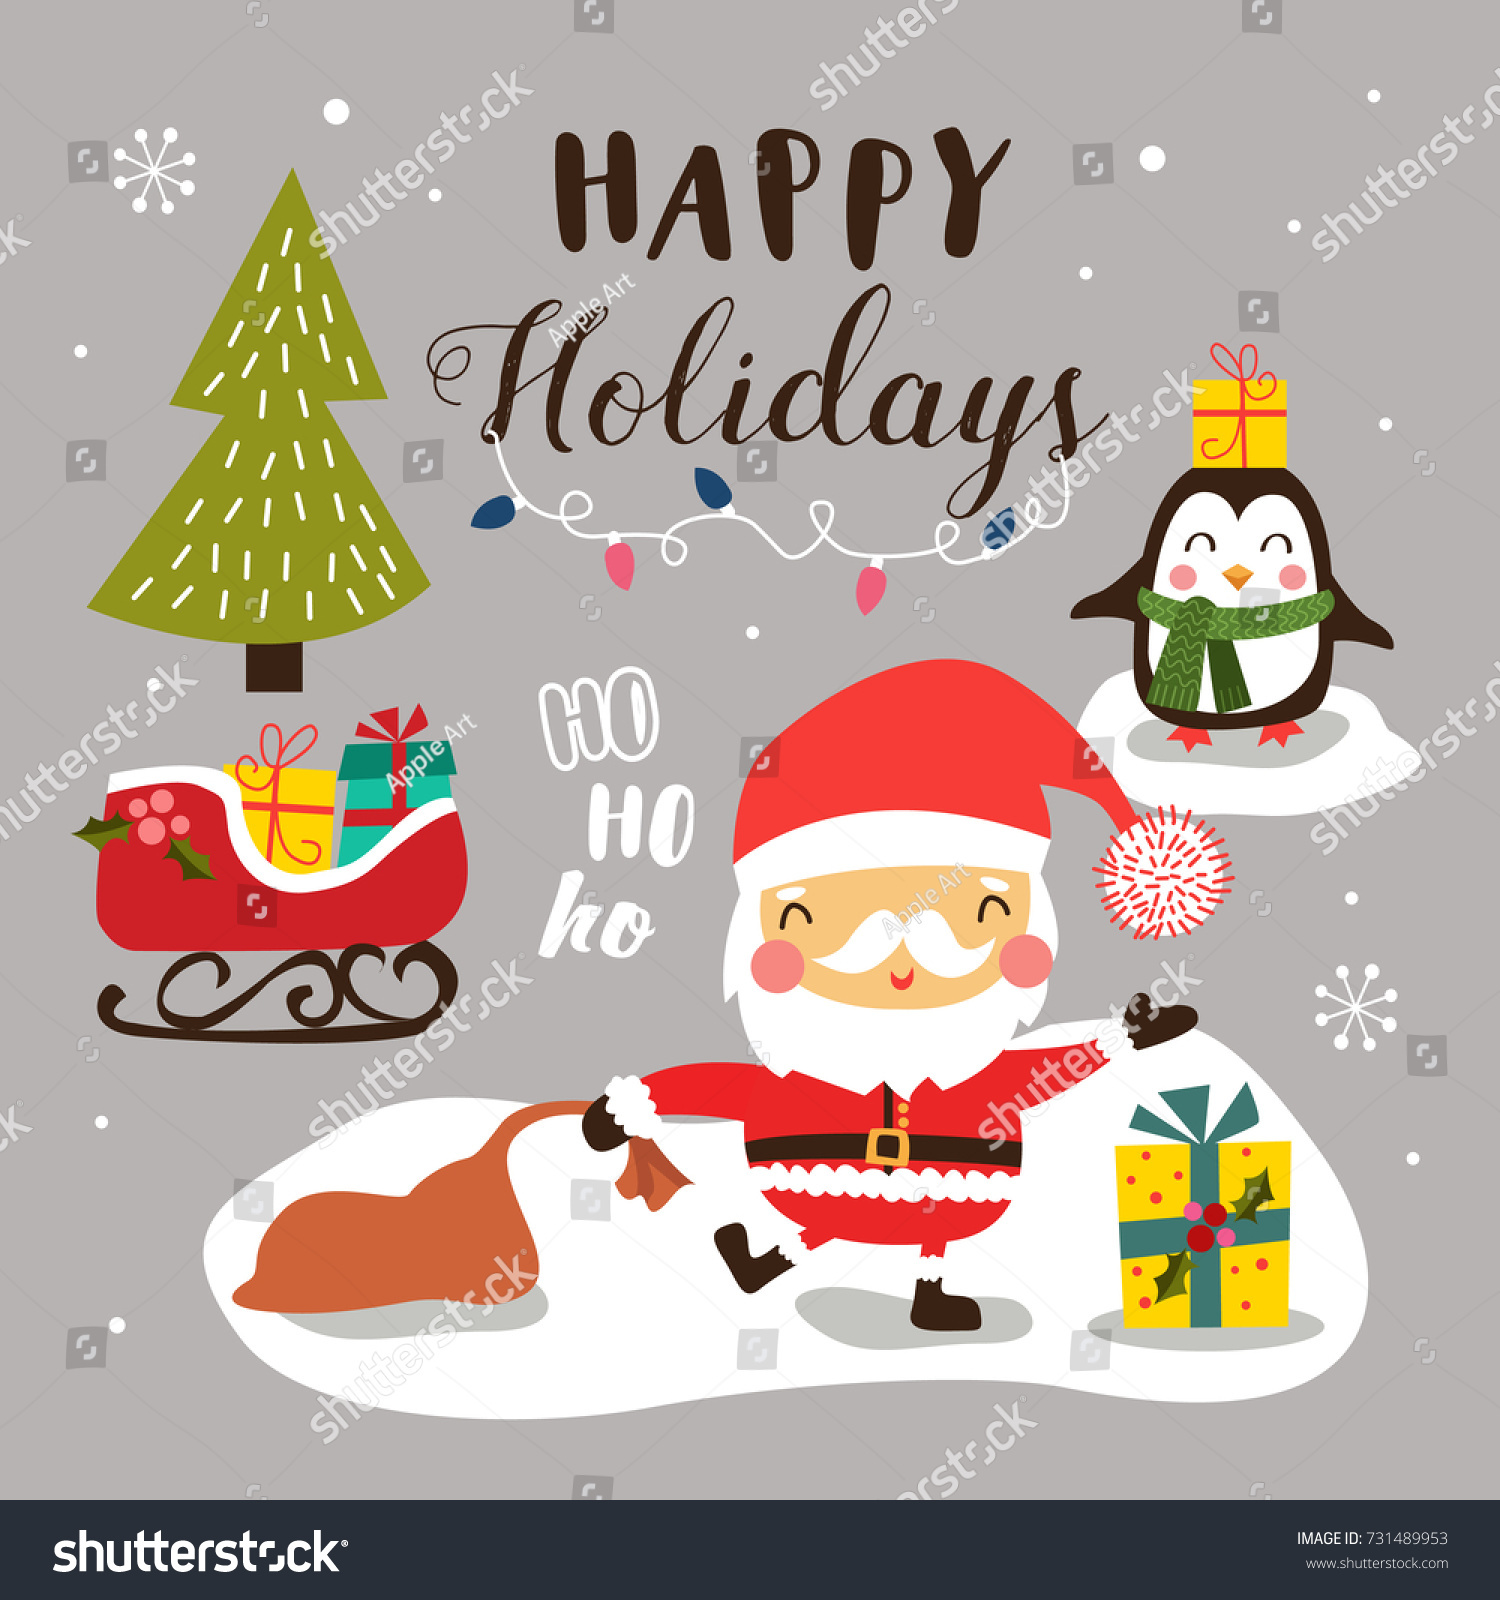 Merry Christmas Background With Cute Cartoon Santa Claus